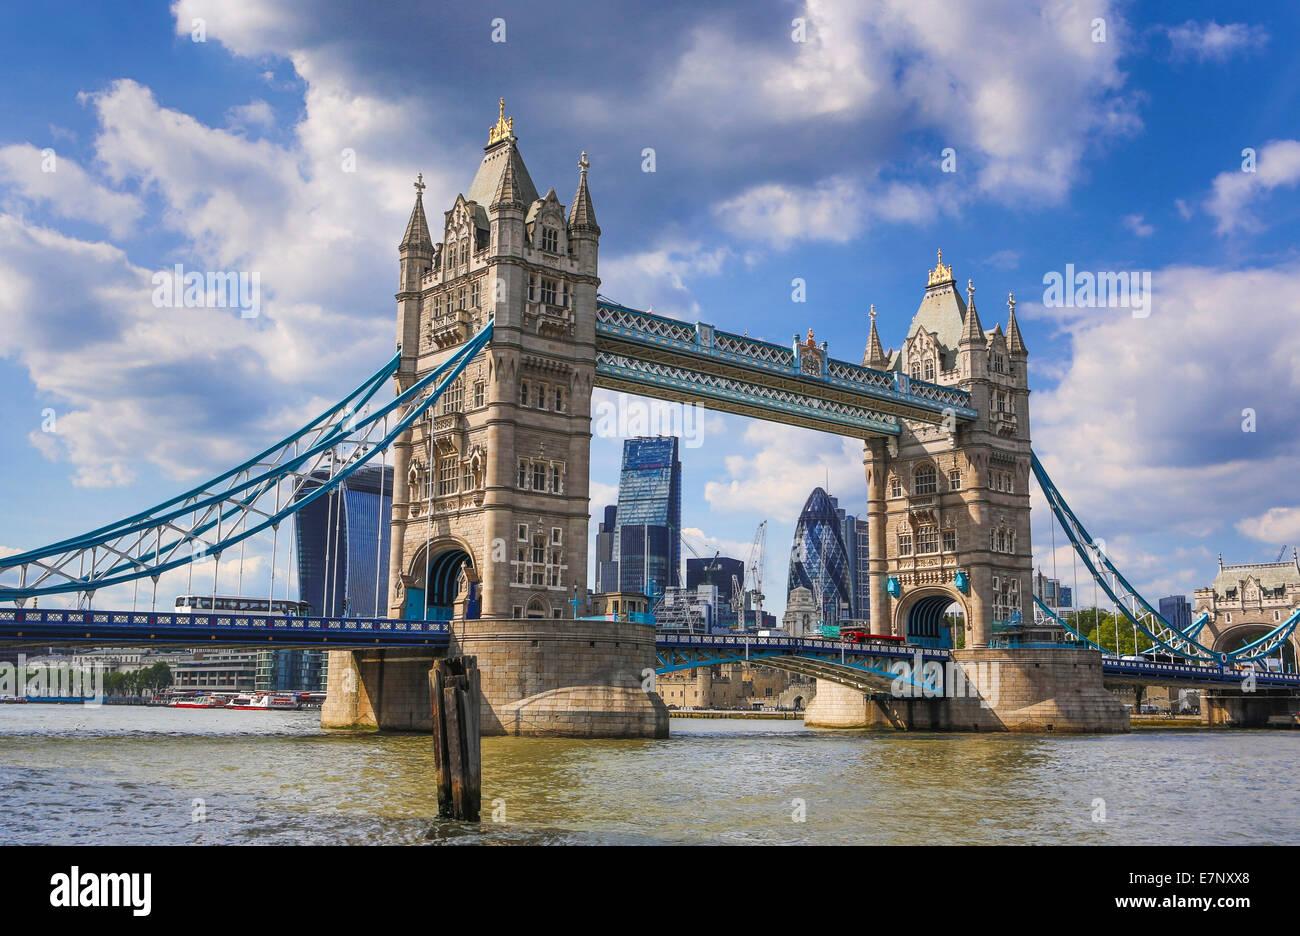 City, London, England, UK, architecture, bridge, famous, skyline, Thames, river, tourism, travel, Tower Bridge, - Stock Image